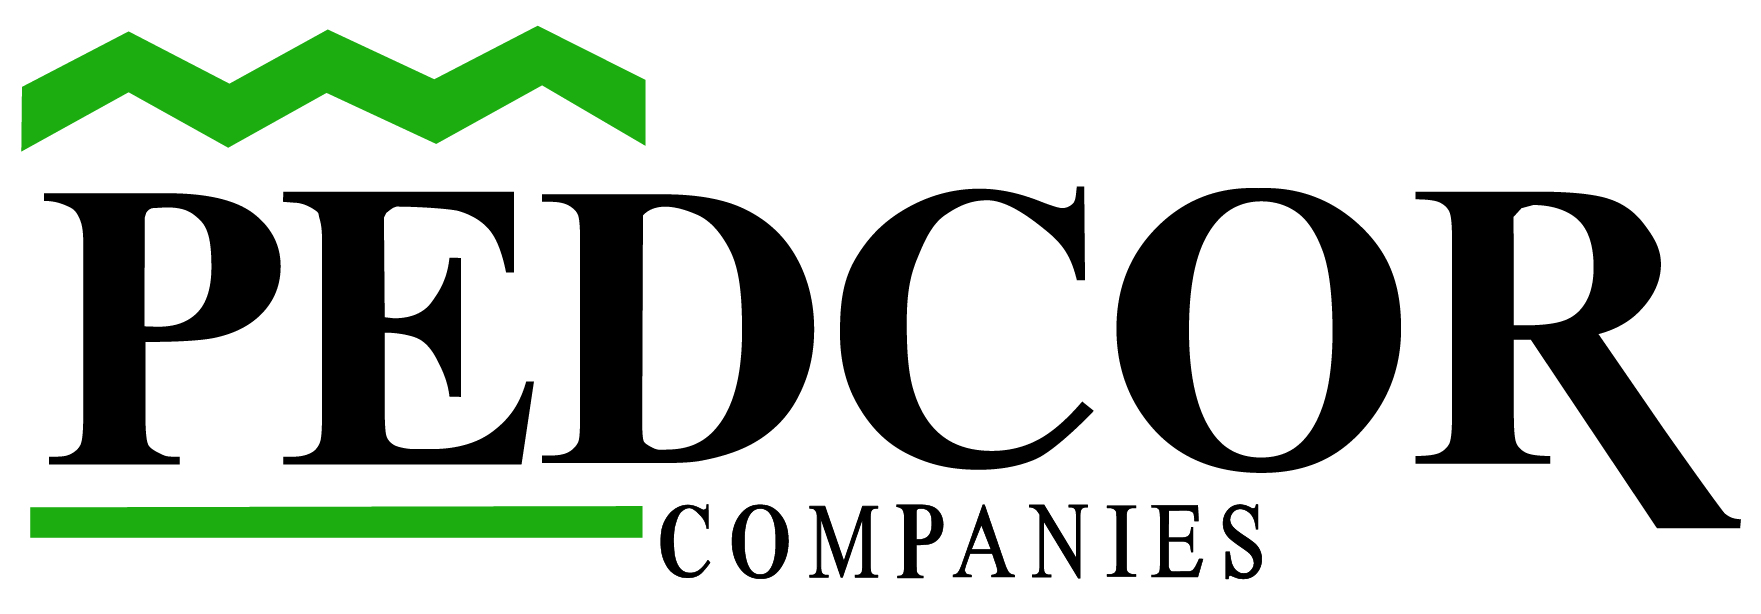 PedcorCompanies Logo color-01.jpg